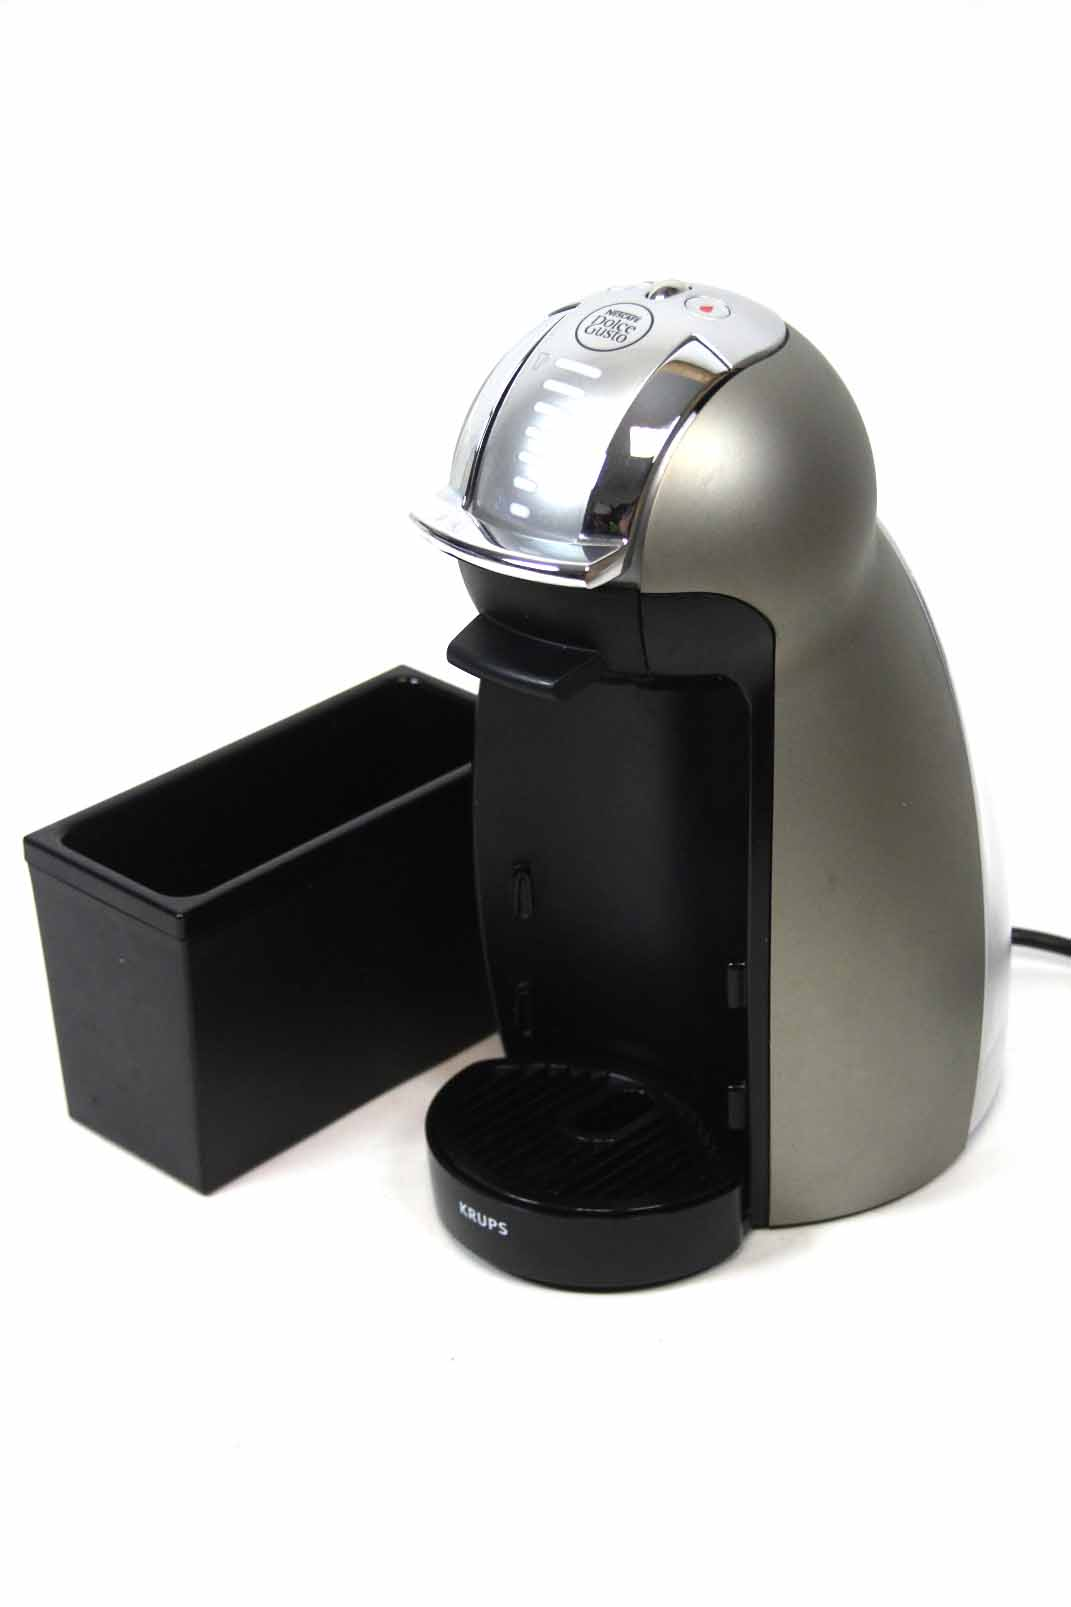 krups nescafe dolce gusto kp 150 kaffeeautomat. Black Bedroom Furniture Sets. Home Design Ideas